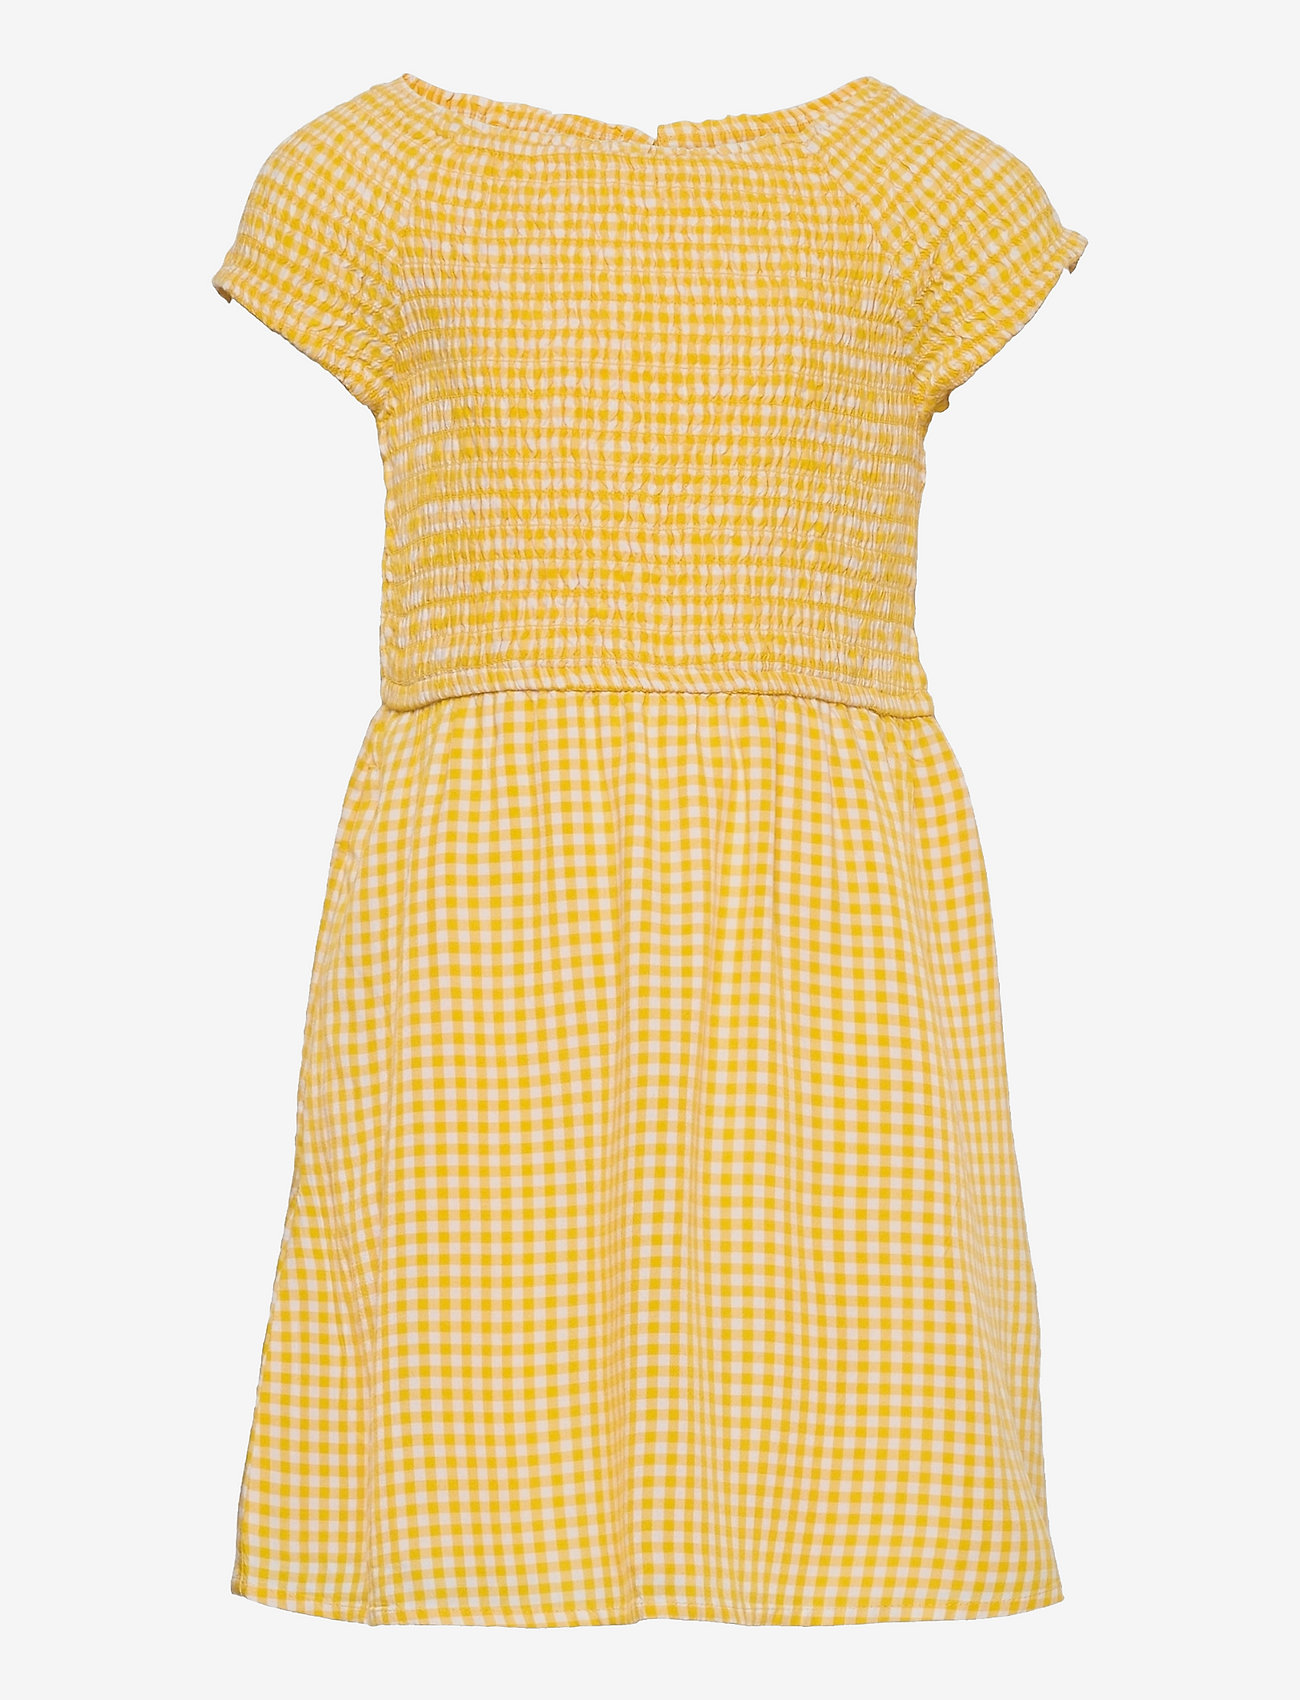 Abercrombie & Fitch - kids GIRLS DRESSES - kleider - light yellow patt - 0